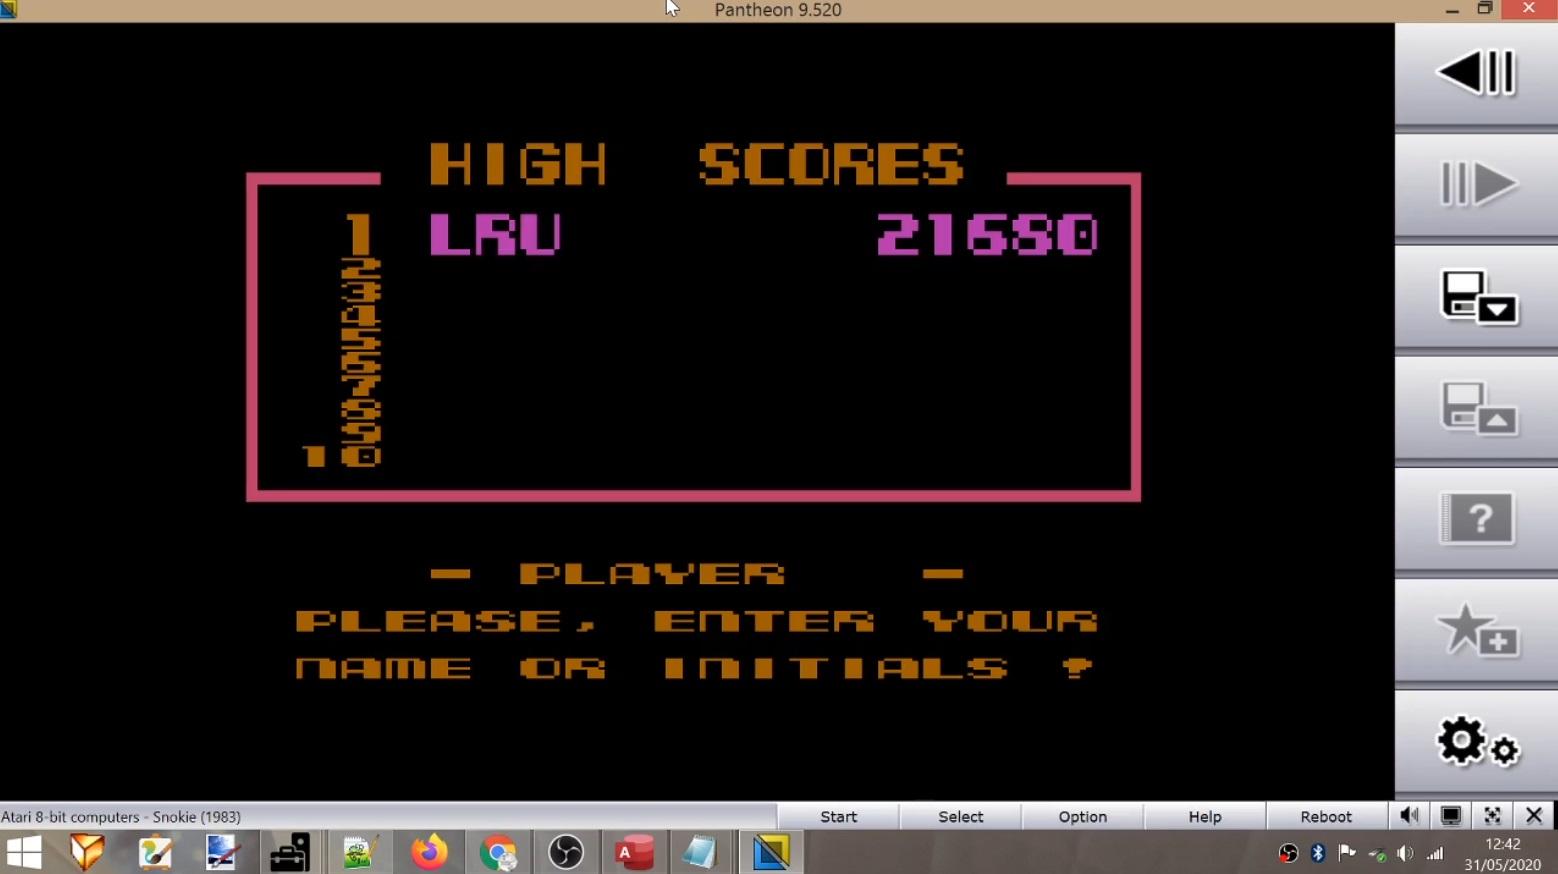 Snokie 21,680 points